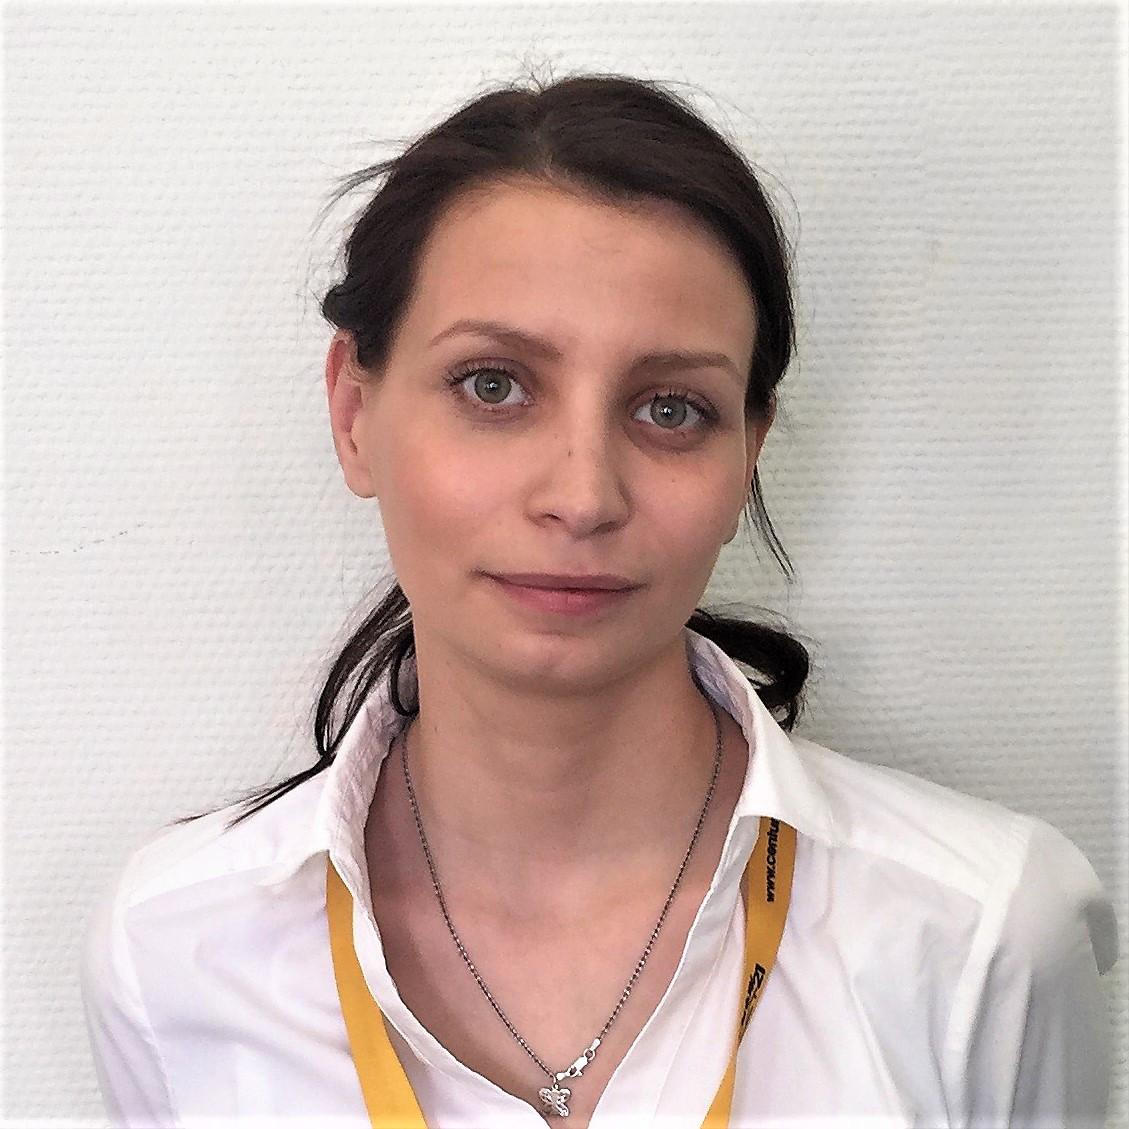 Савельева Марина Дмитриевна